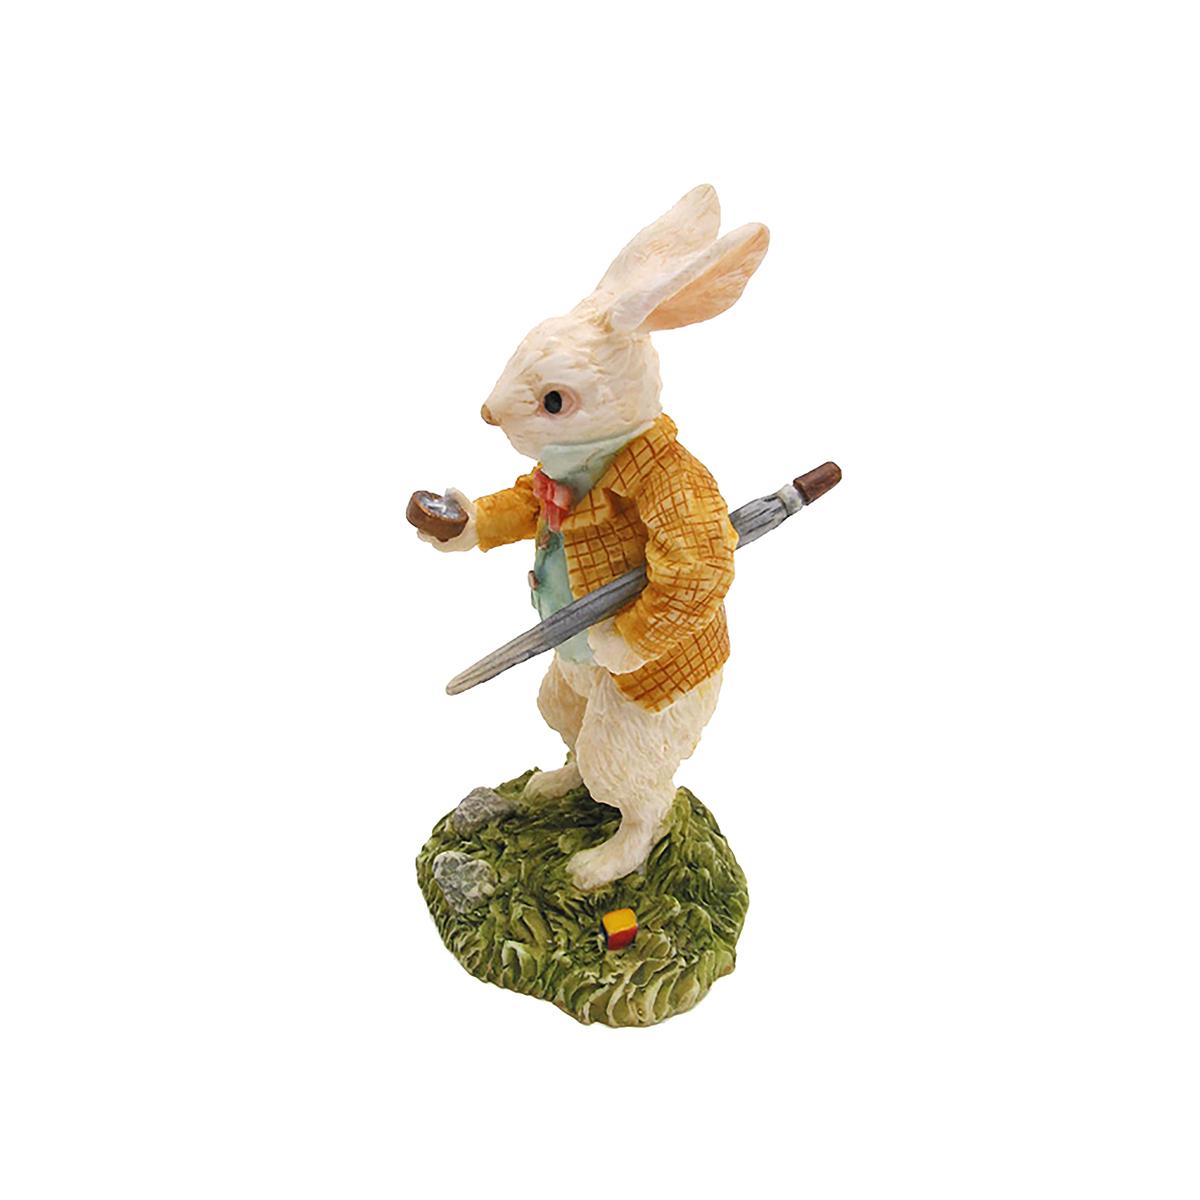 White Rabbit figurine